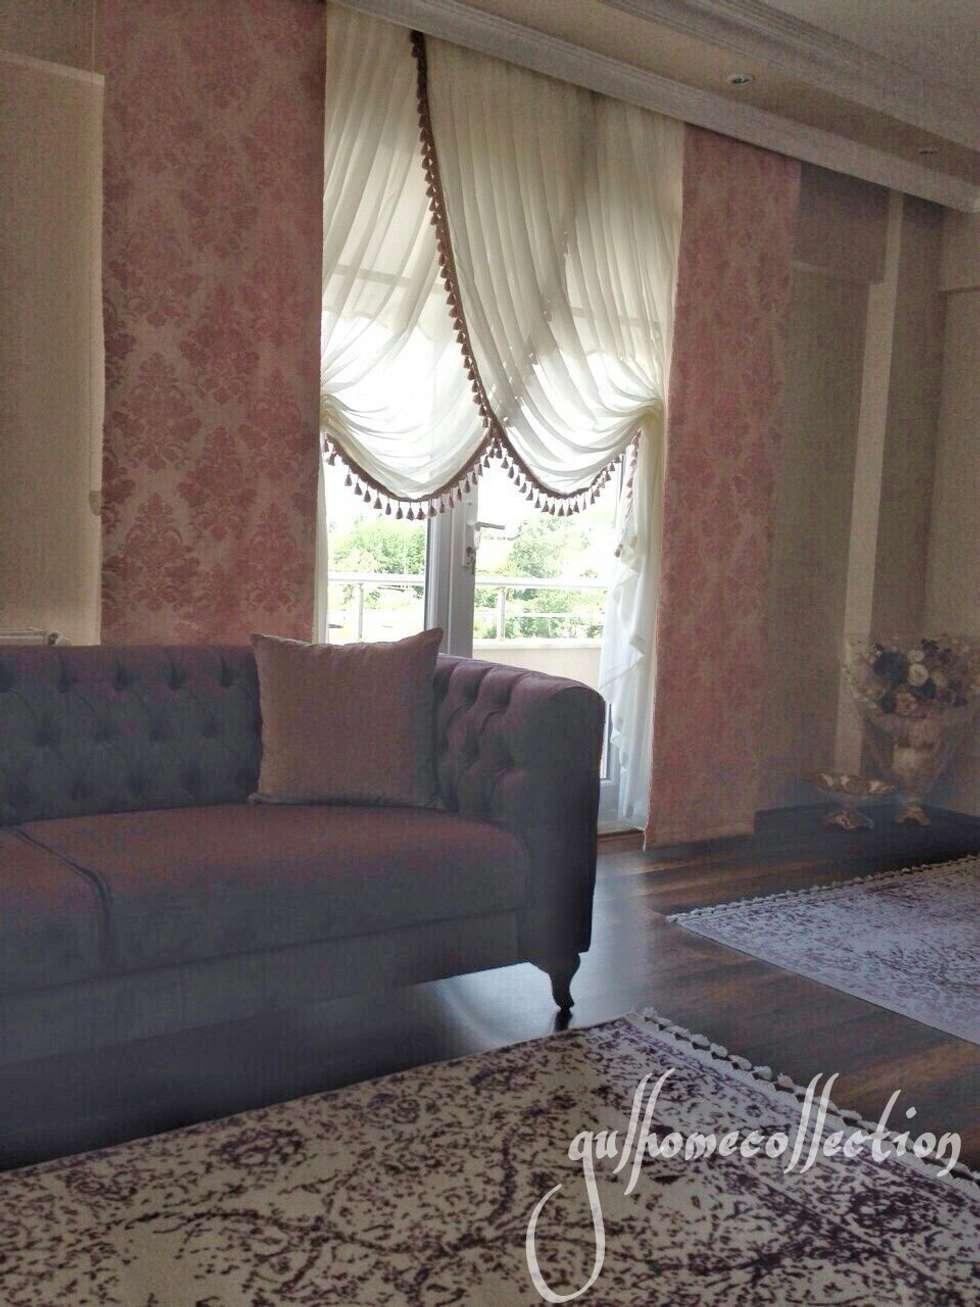 Gulperde  – Gulhomecollection: modern tarz Oturma Odası